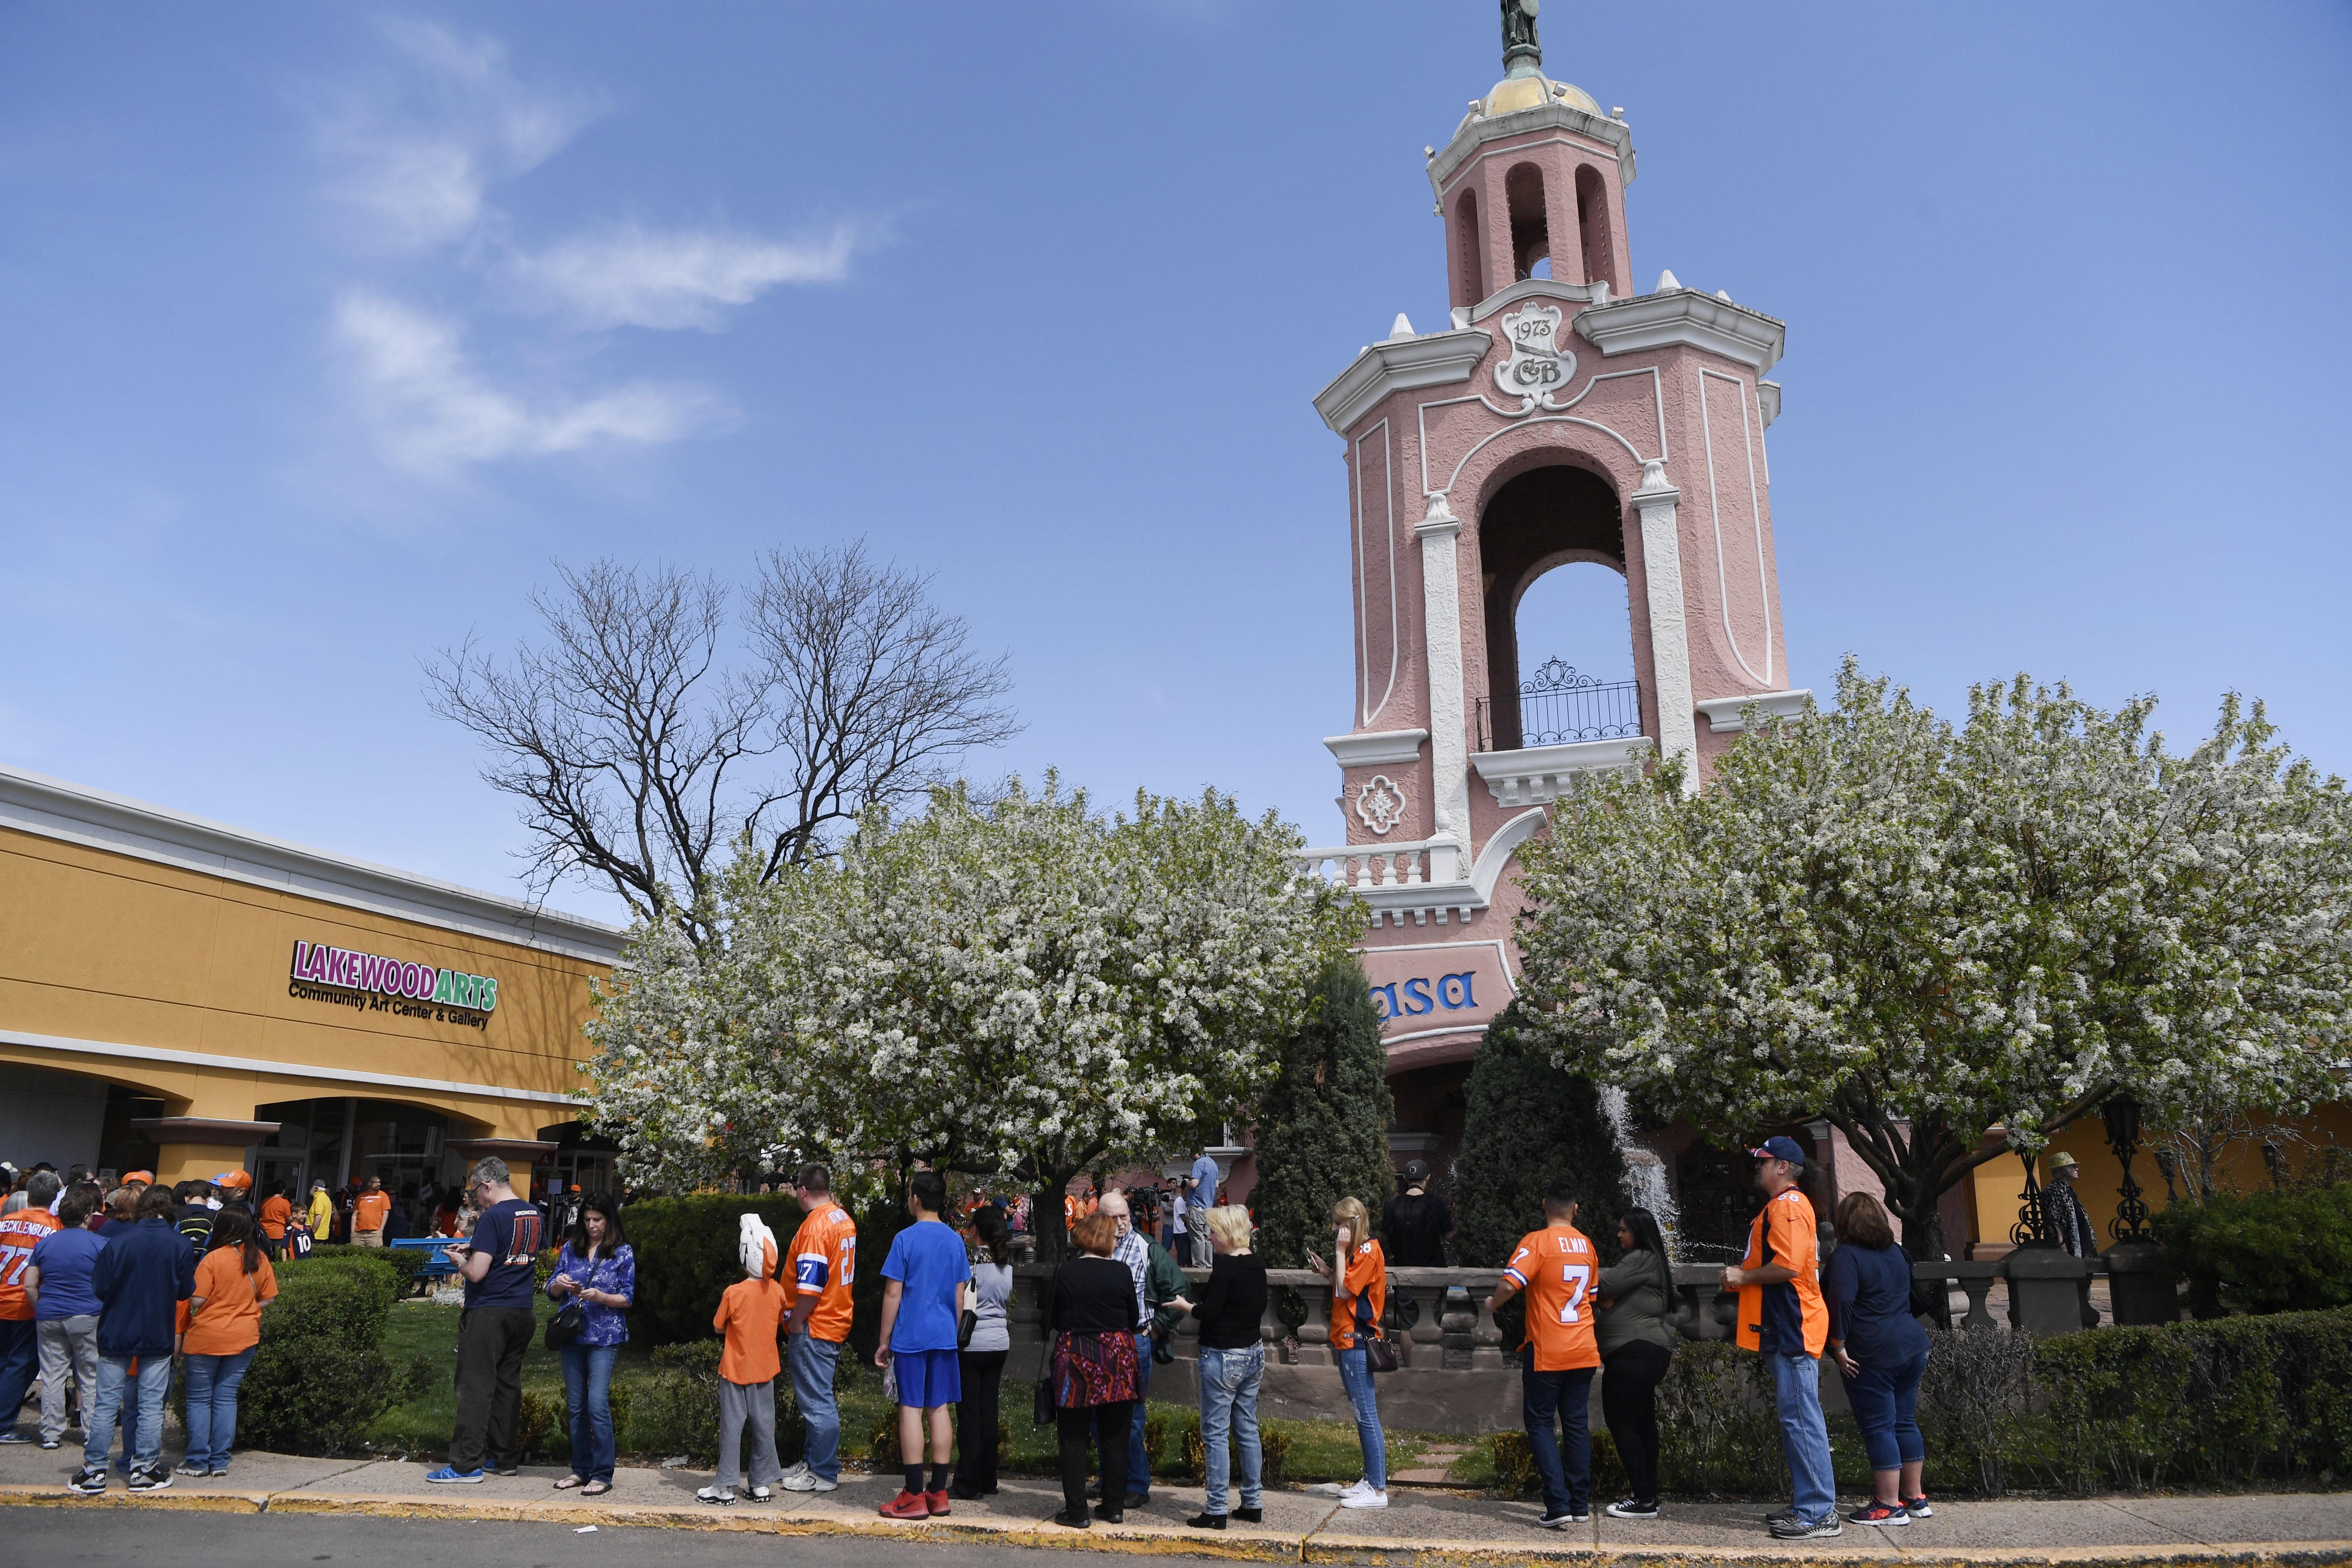 South Park creators purchase popular Casa Bonita restaurant featured on show